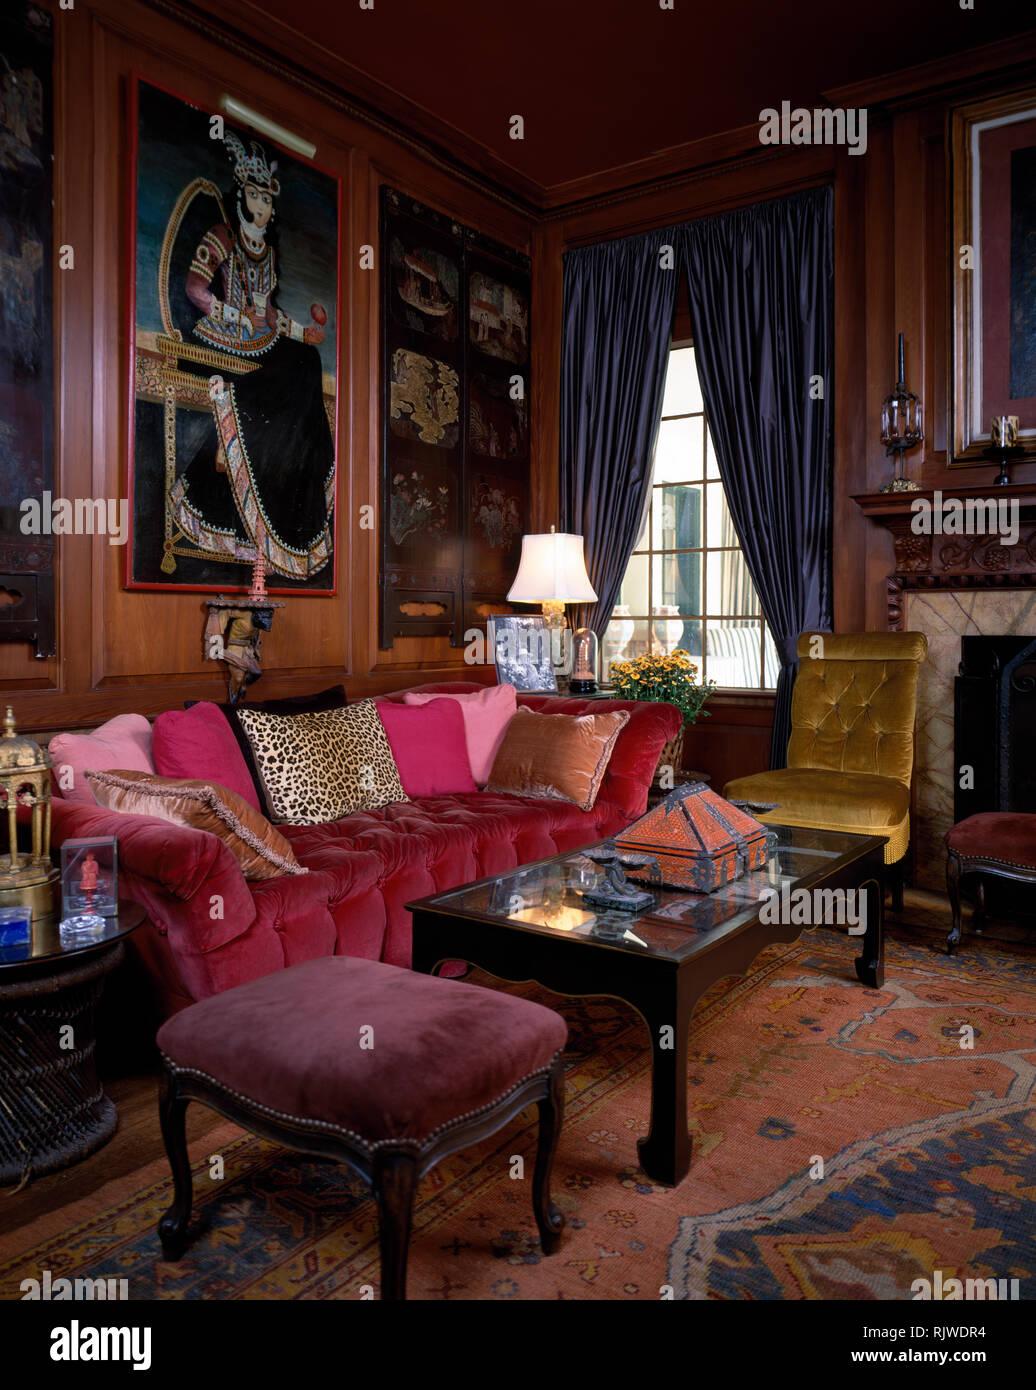 Pink Velvet Sofa In Opulent Sitting Room Stock Photo Alamy